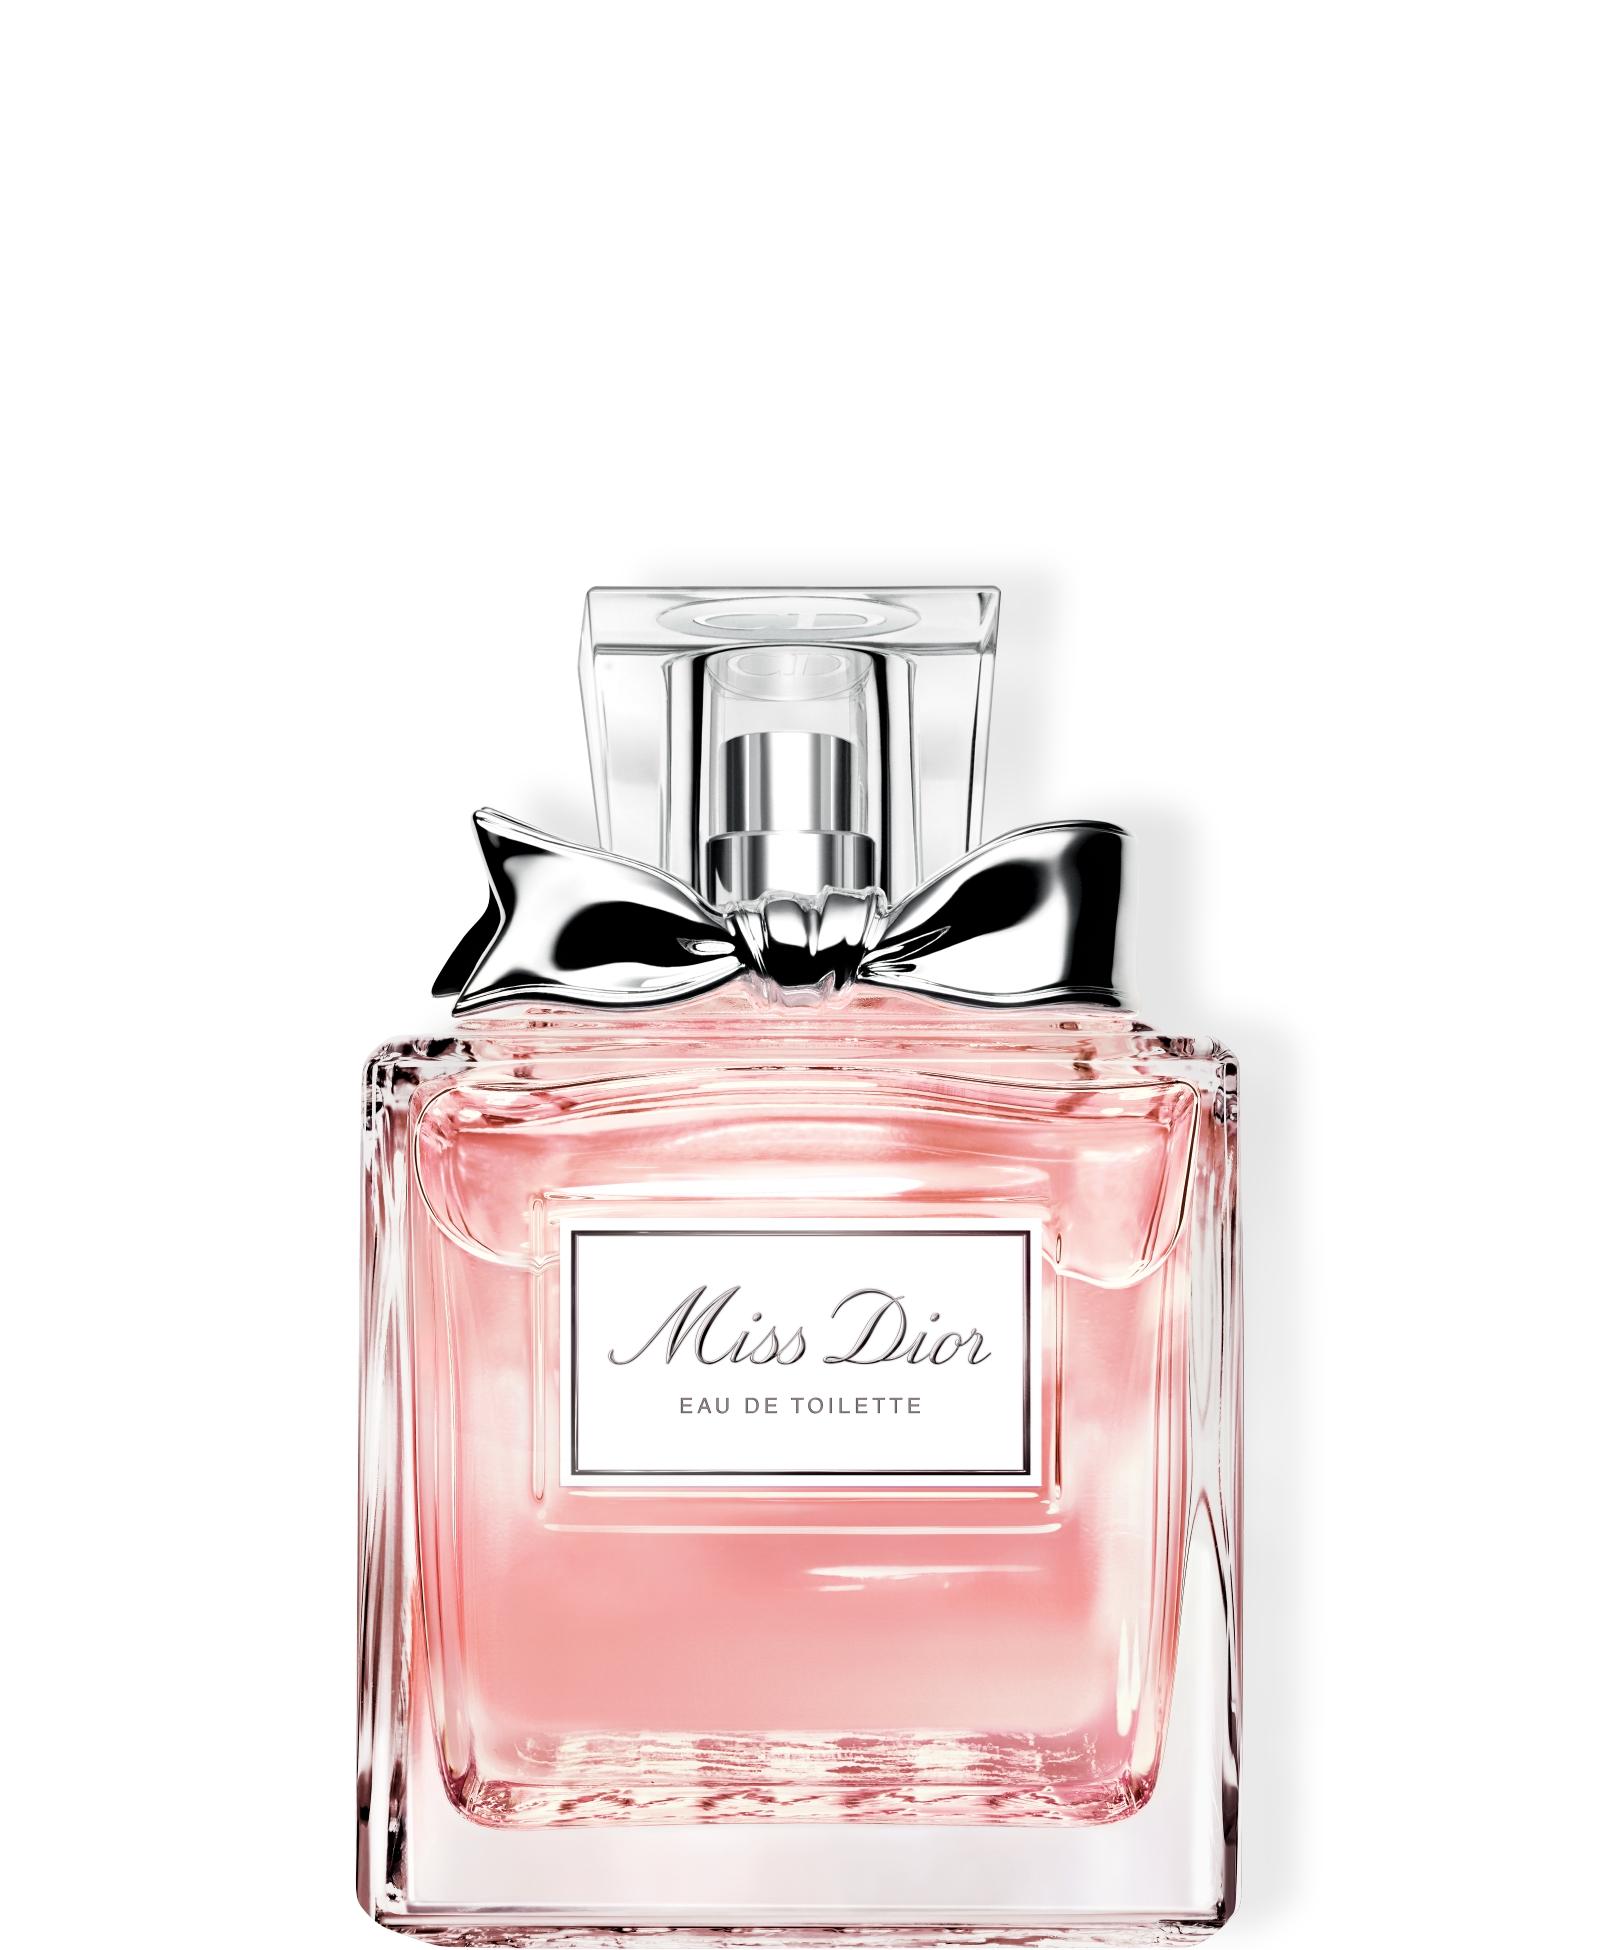 DIOR Miss Dior Eau de Toilette, 50 ml